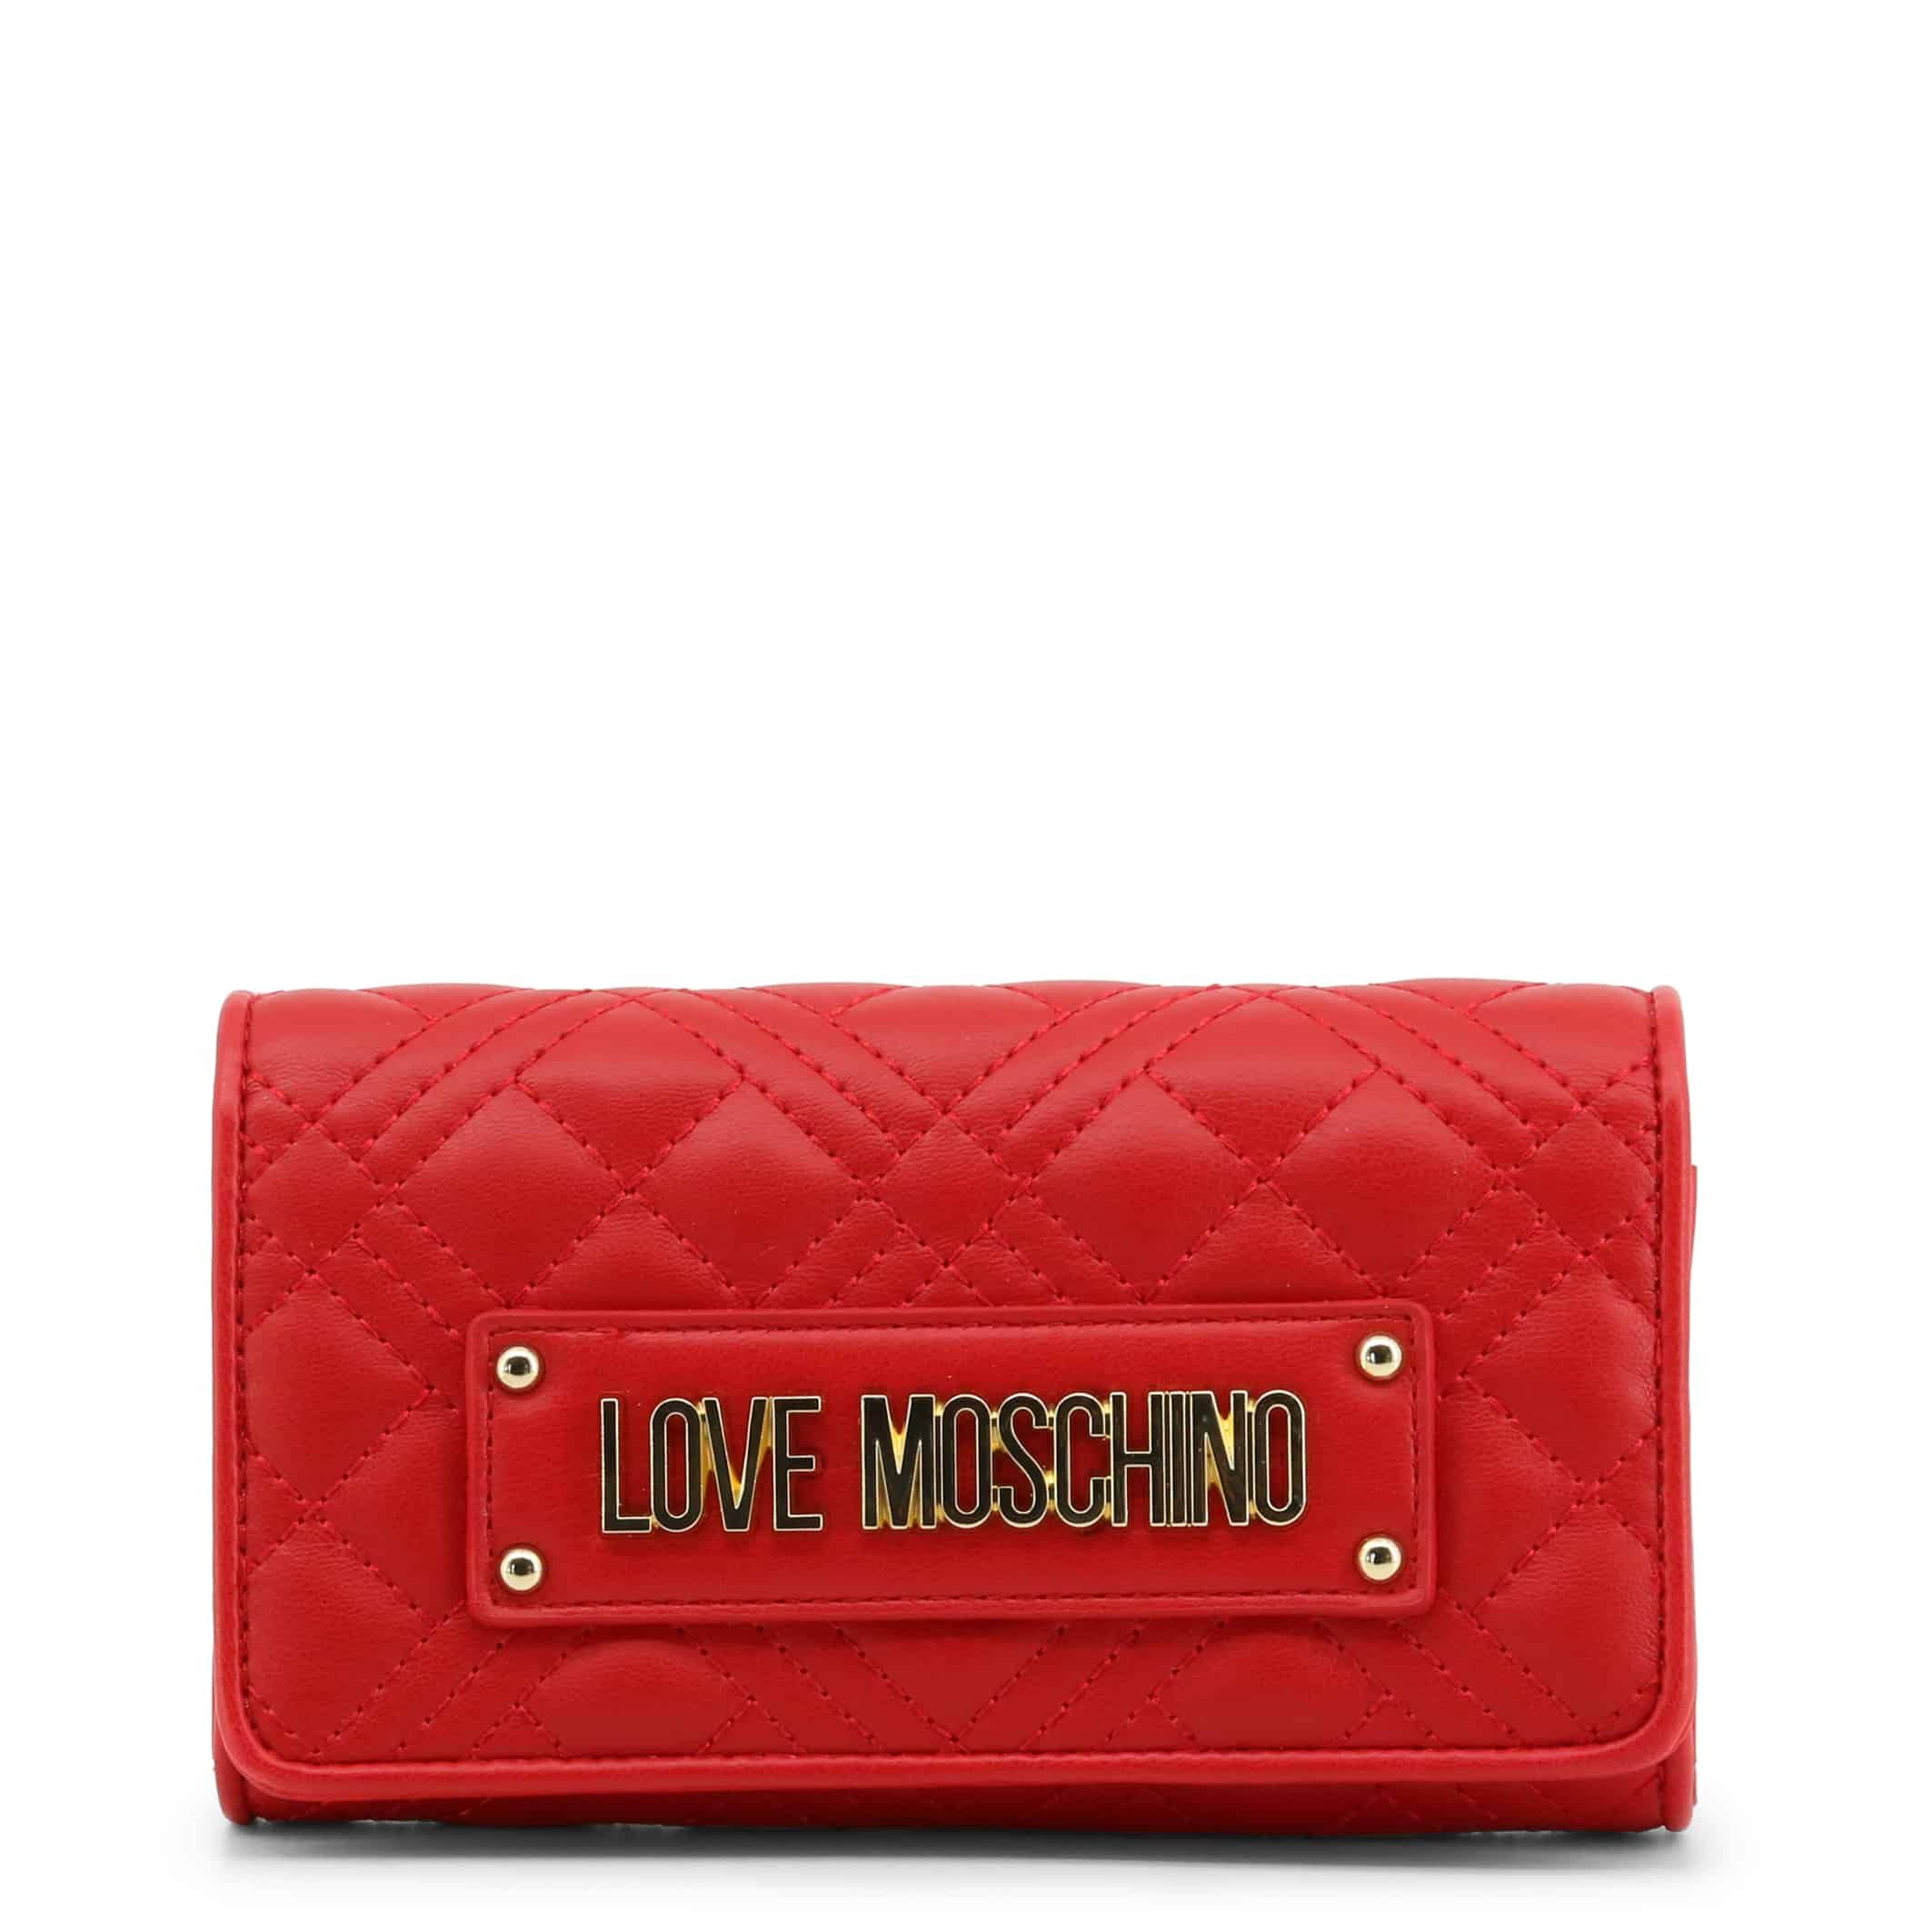 Love Moschino – JC5630PP0CKA0 – Rood Designeritems.nl